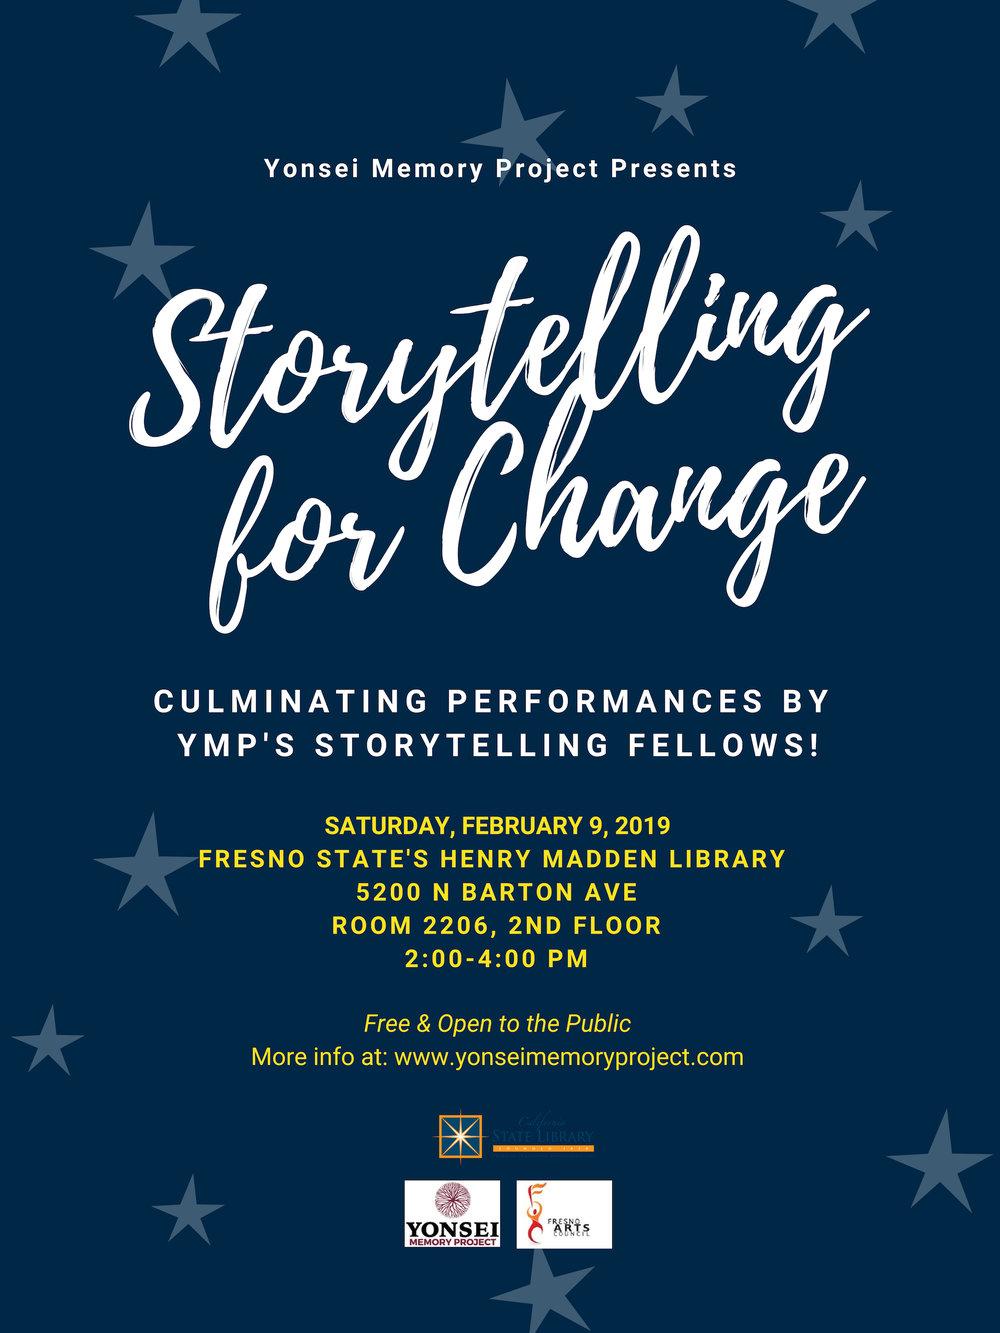 Storytelling for Change final performances - flyer image.